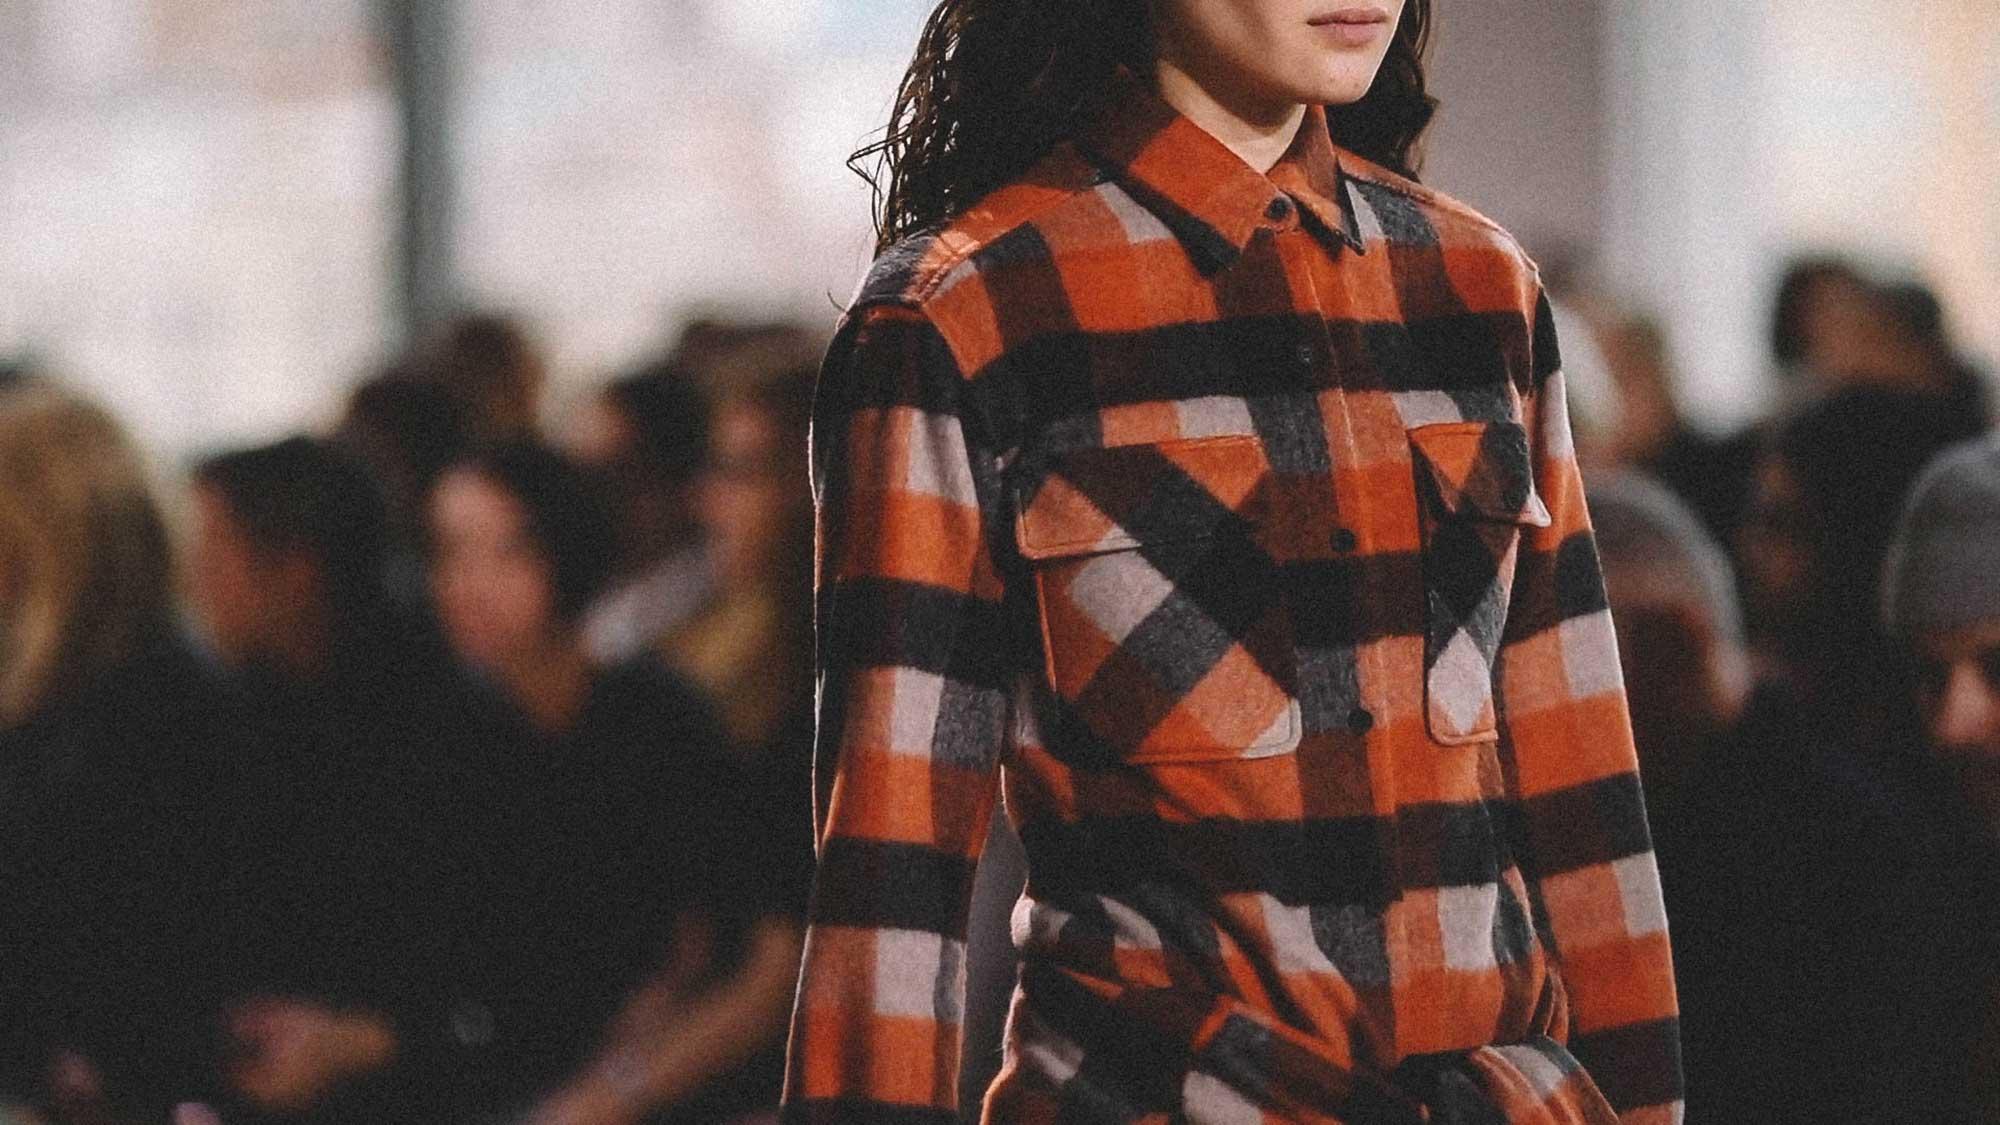 Lacoste-Runway-Show-New-York-Fashion-Week-3.jpg